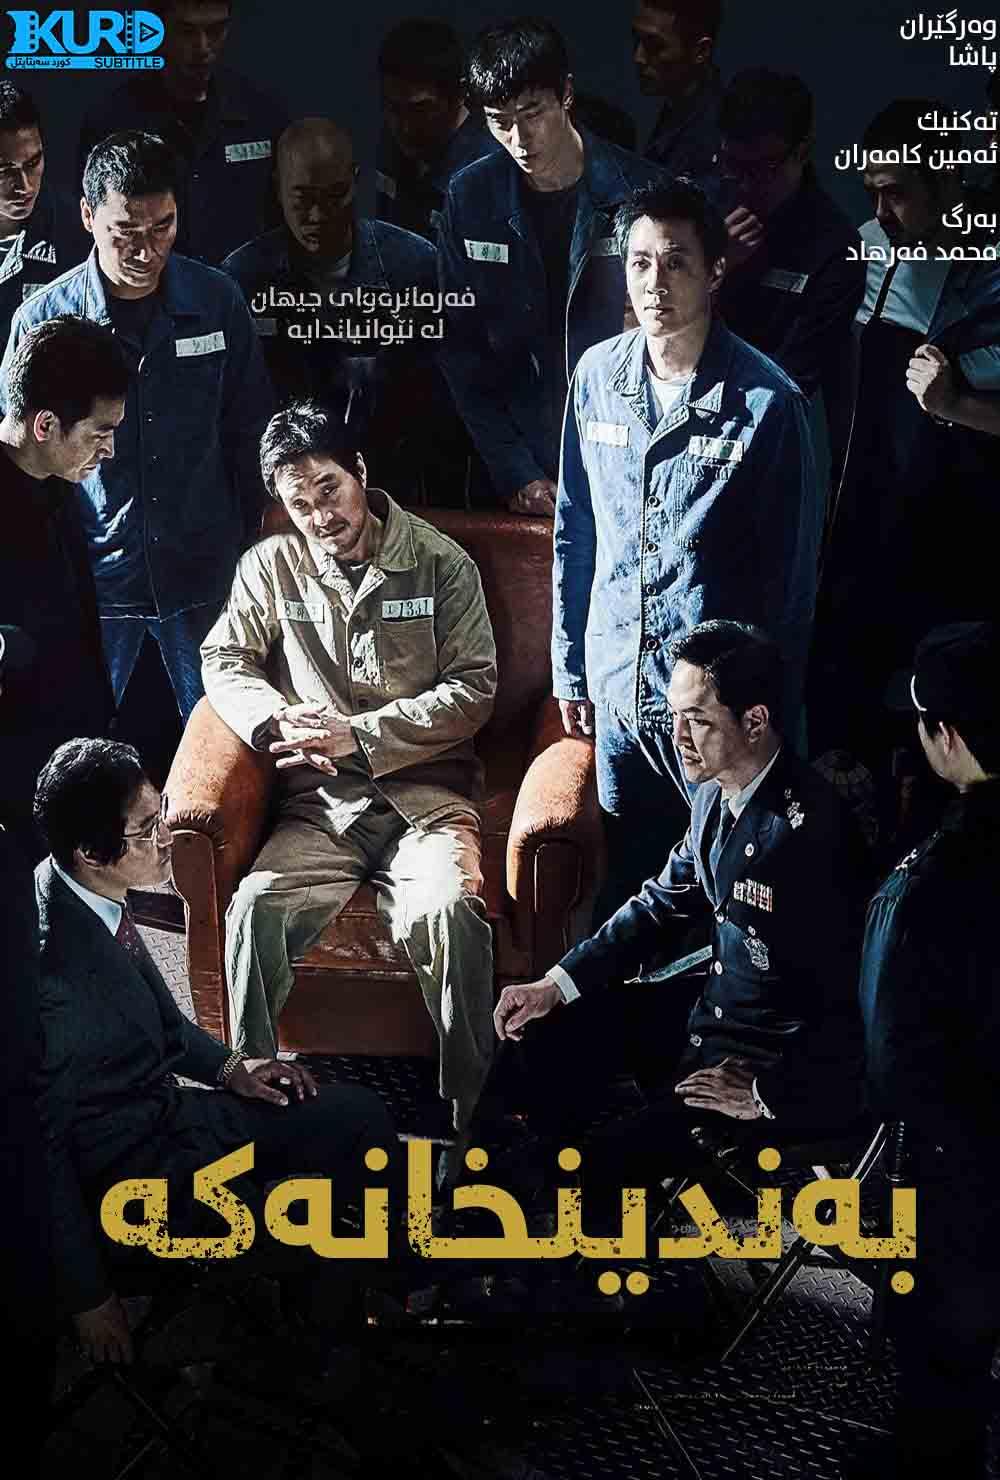 The Prison kurdish poster